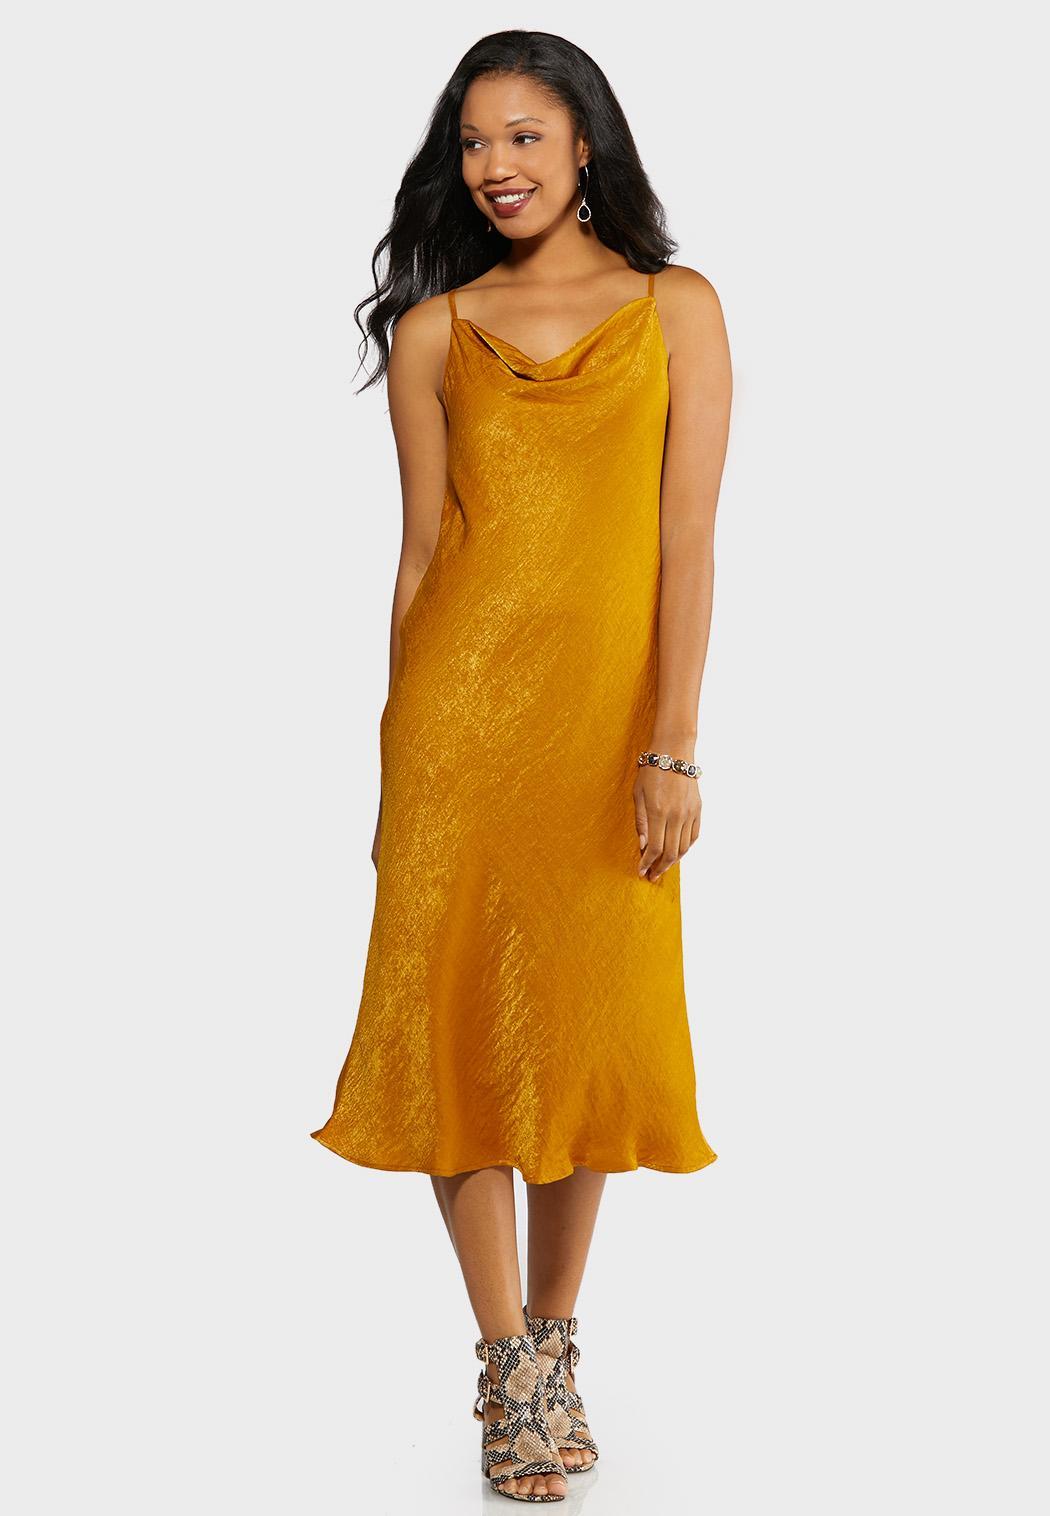 Crushed Satin Slip Dress